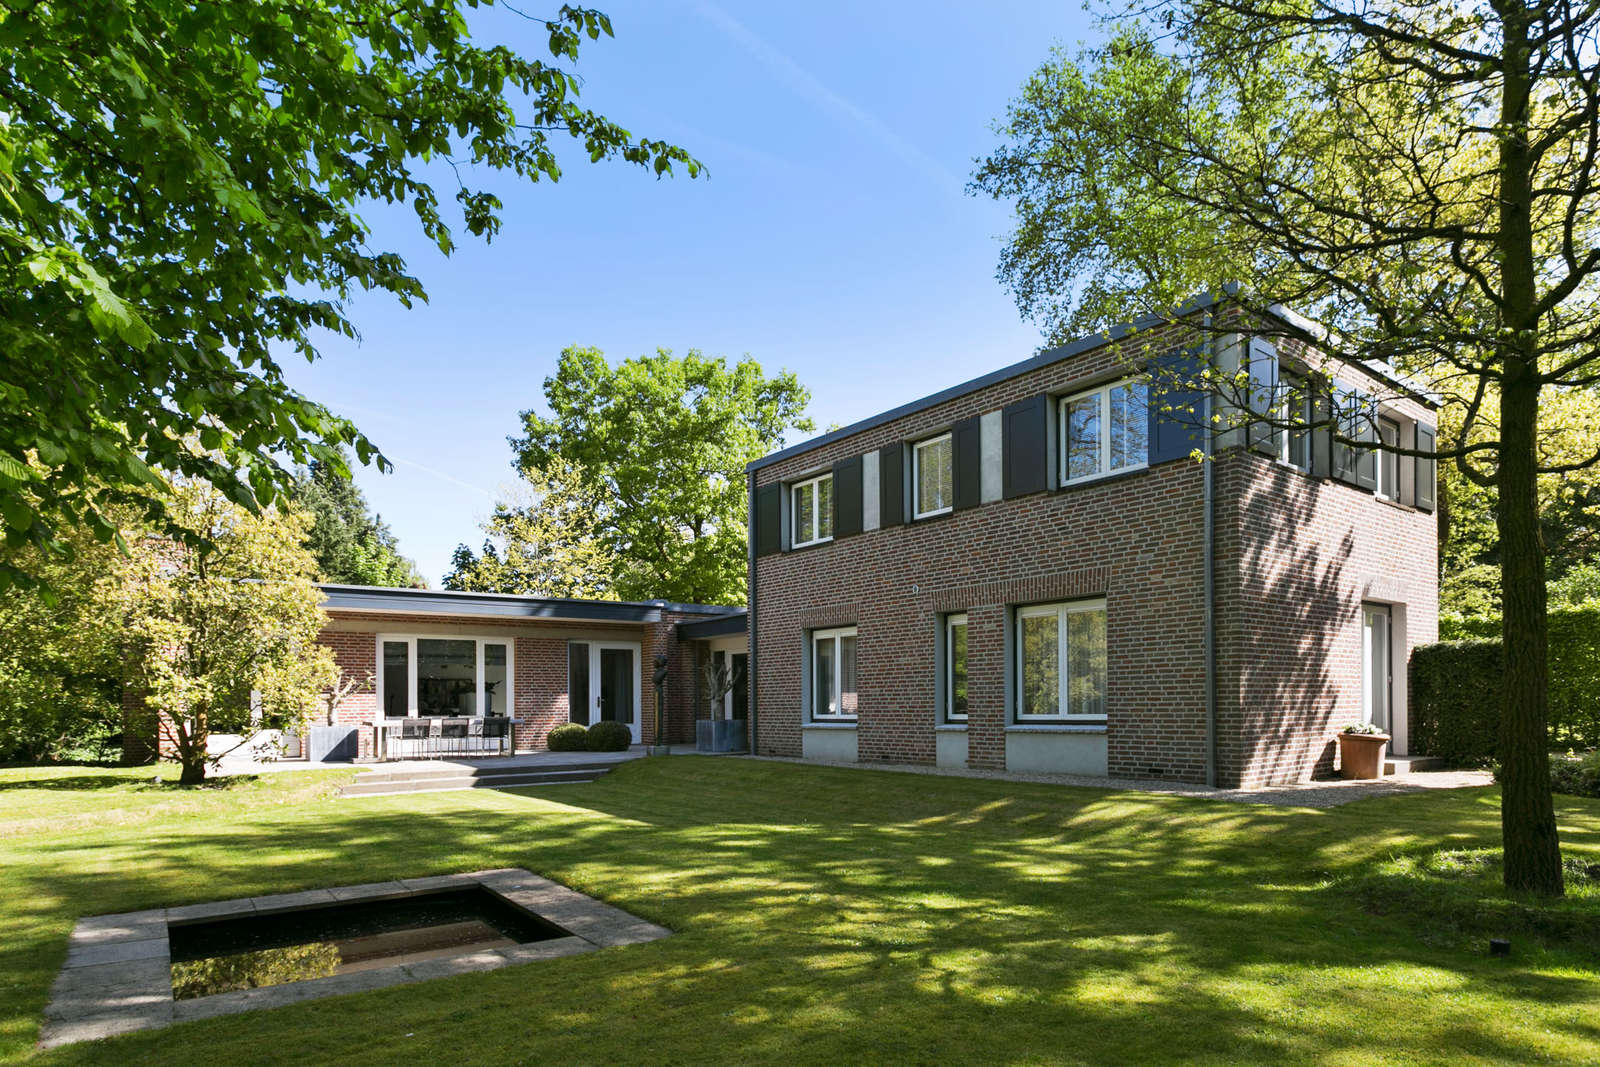 Jkvr de la Courtlaan 6, Villa Rosmalen